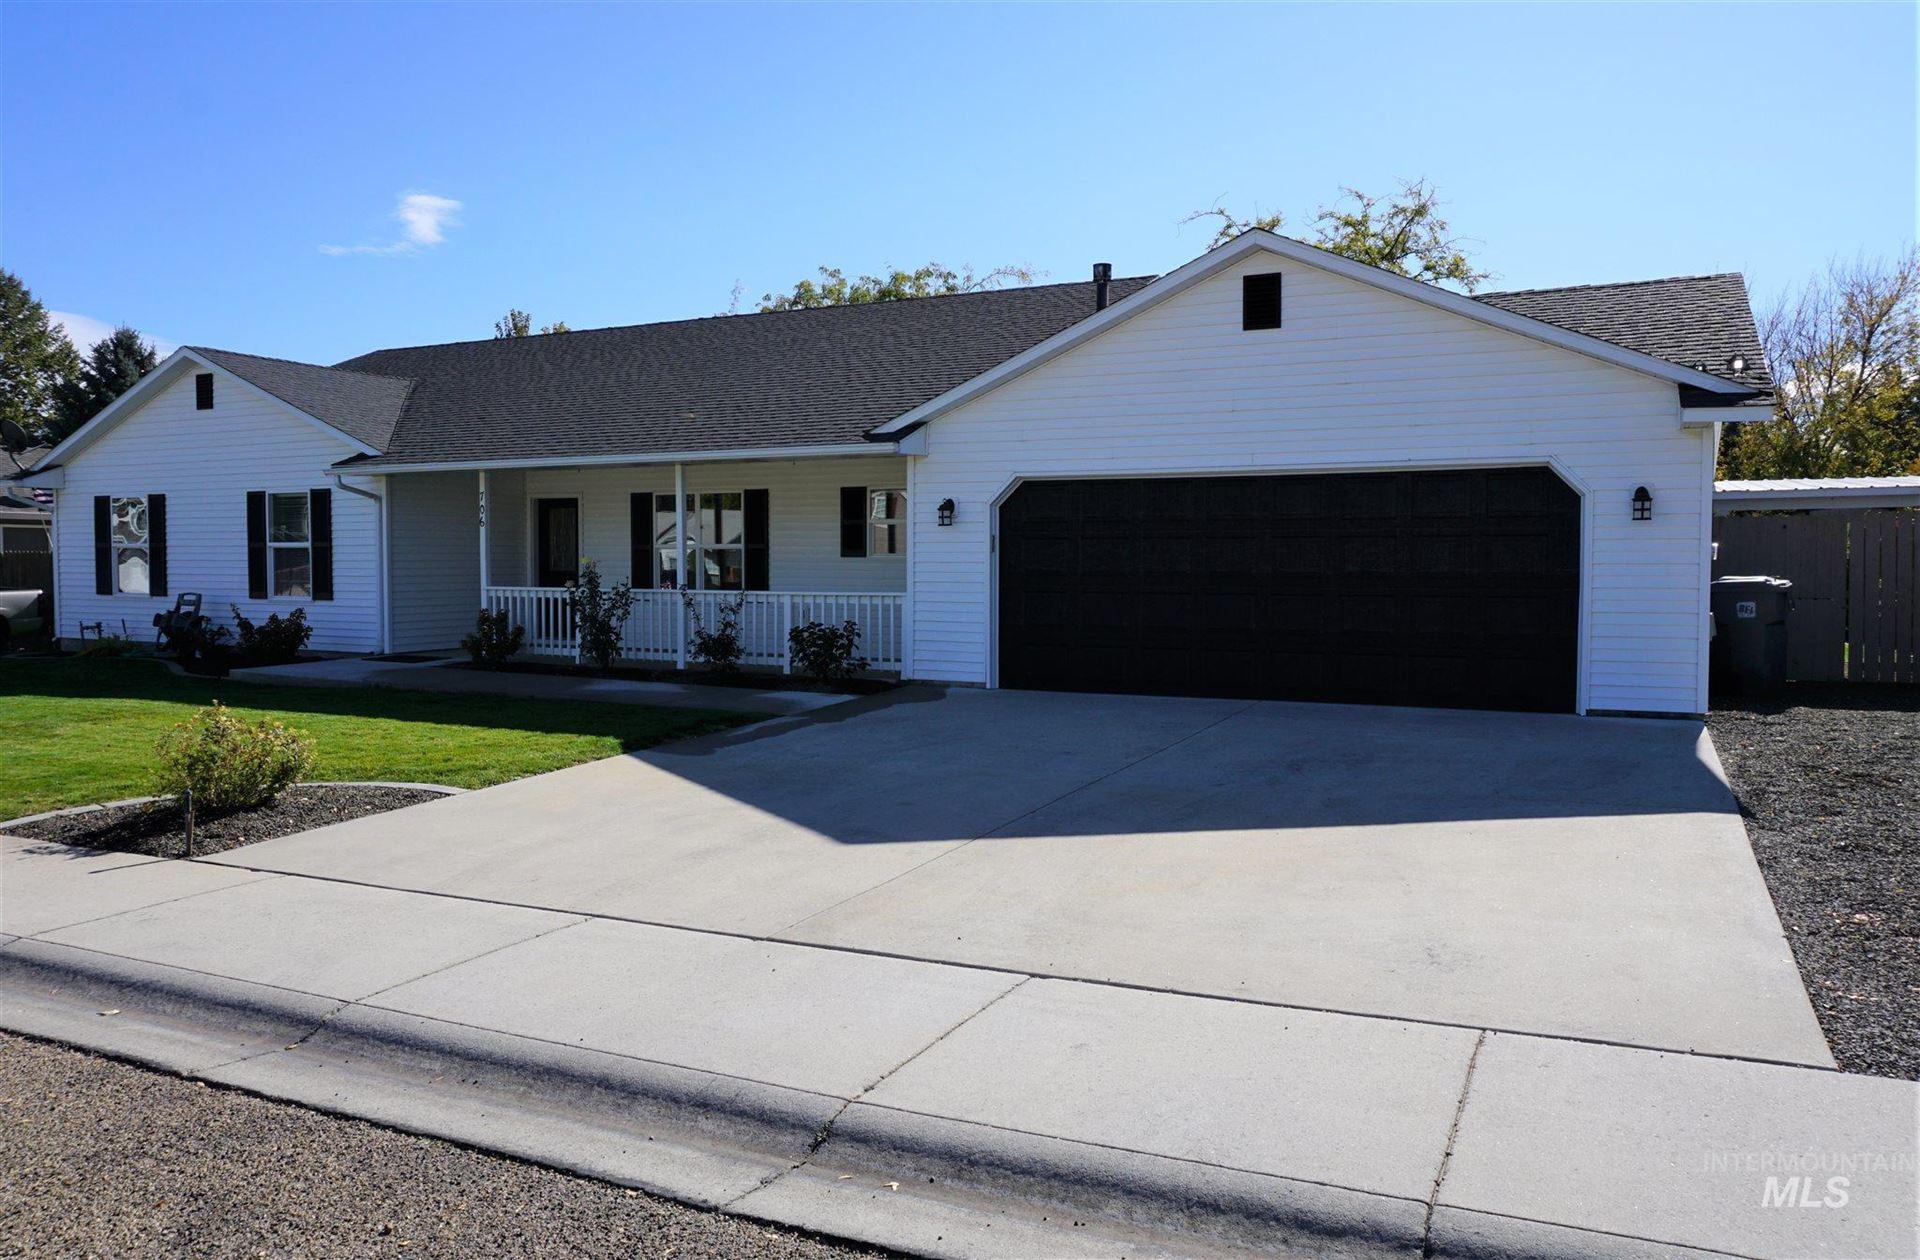 Photo of 706 Chaparro St, Caldwell, ID 83605 (MLS # 98784507)